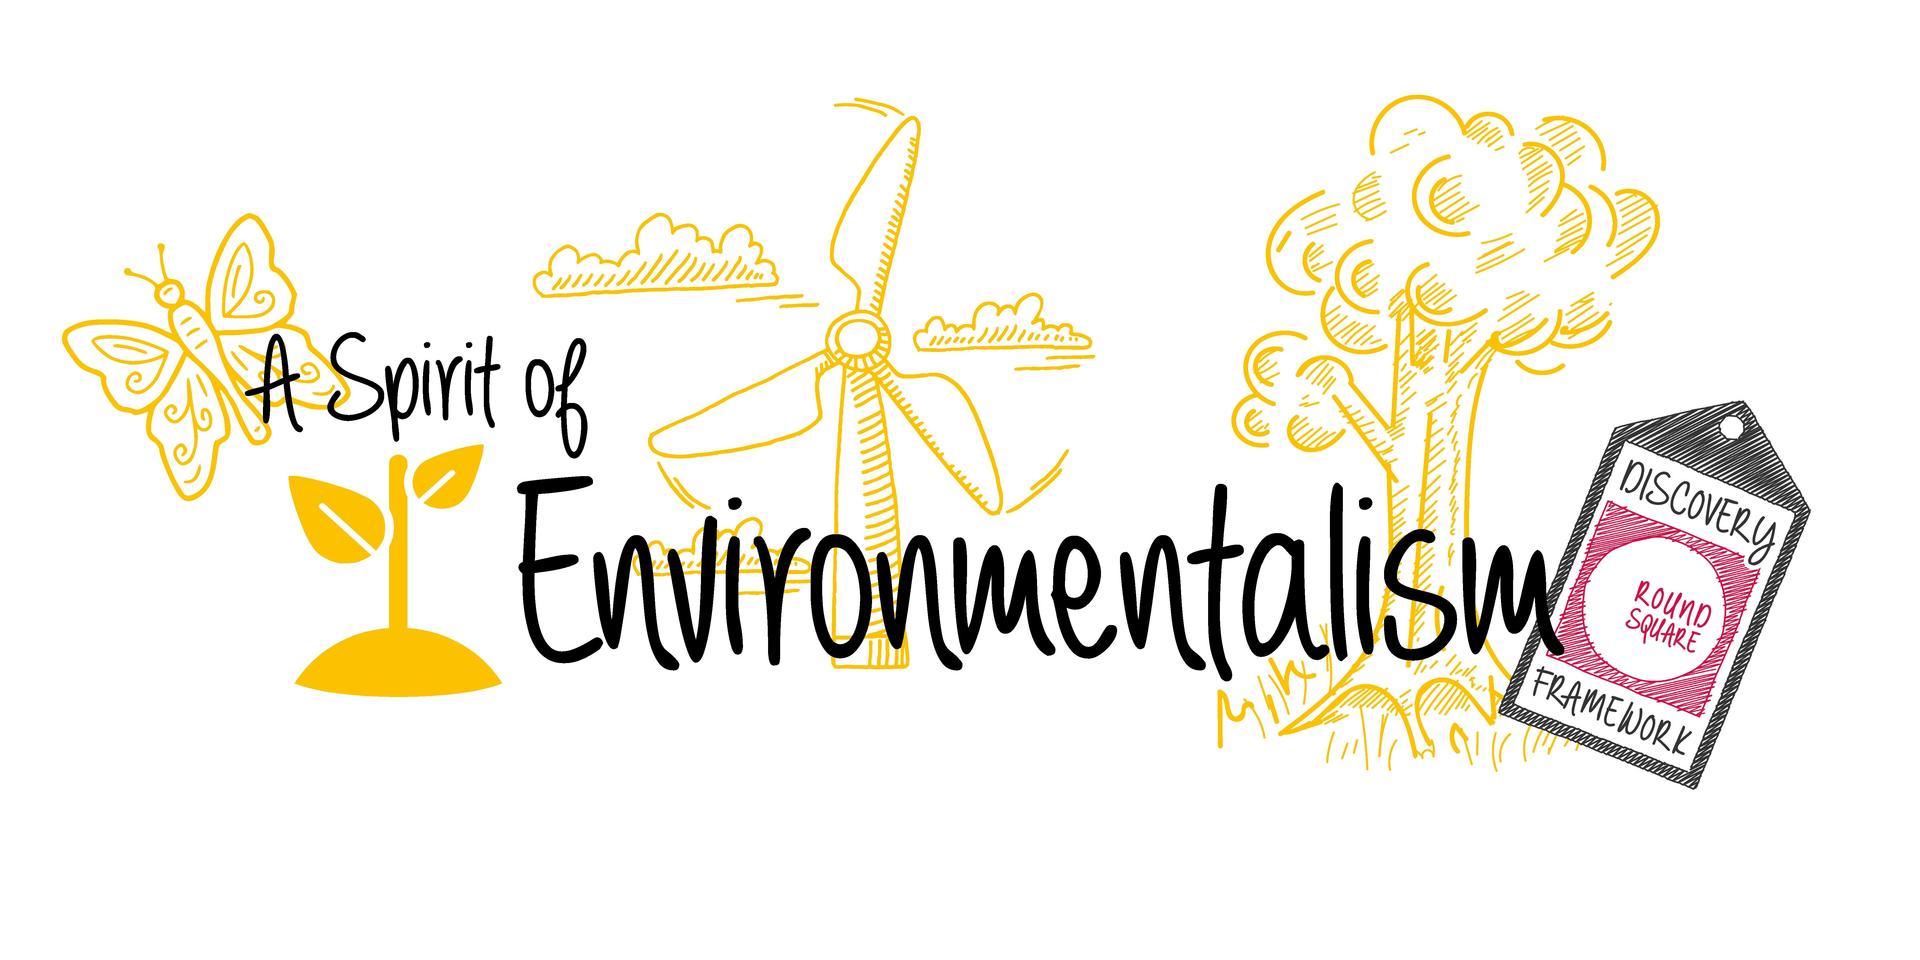 A spirit of environmentalism